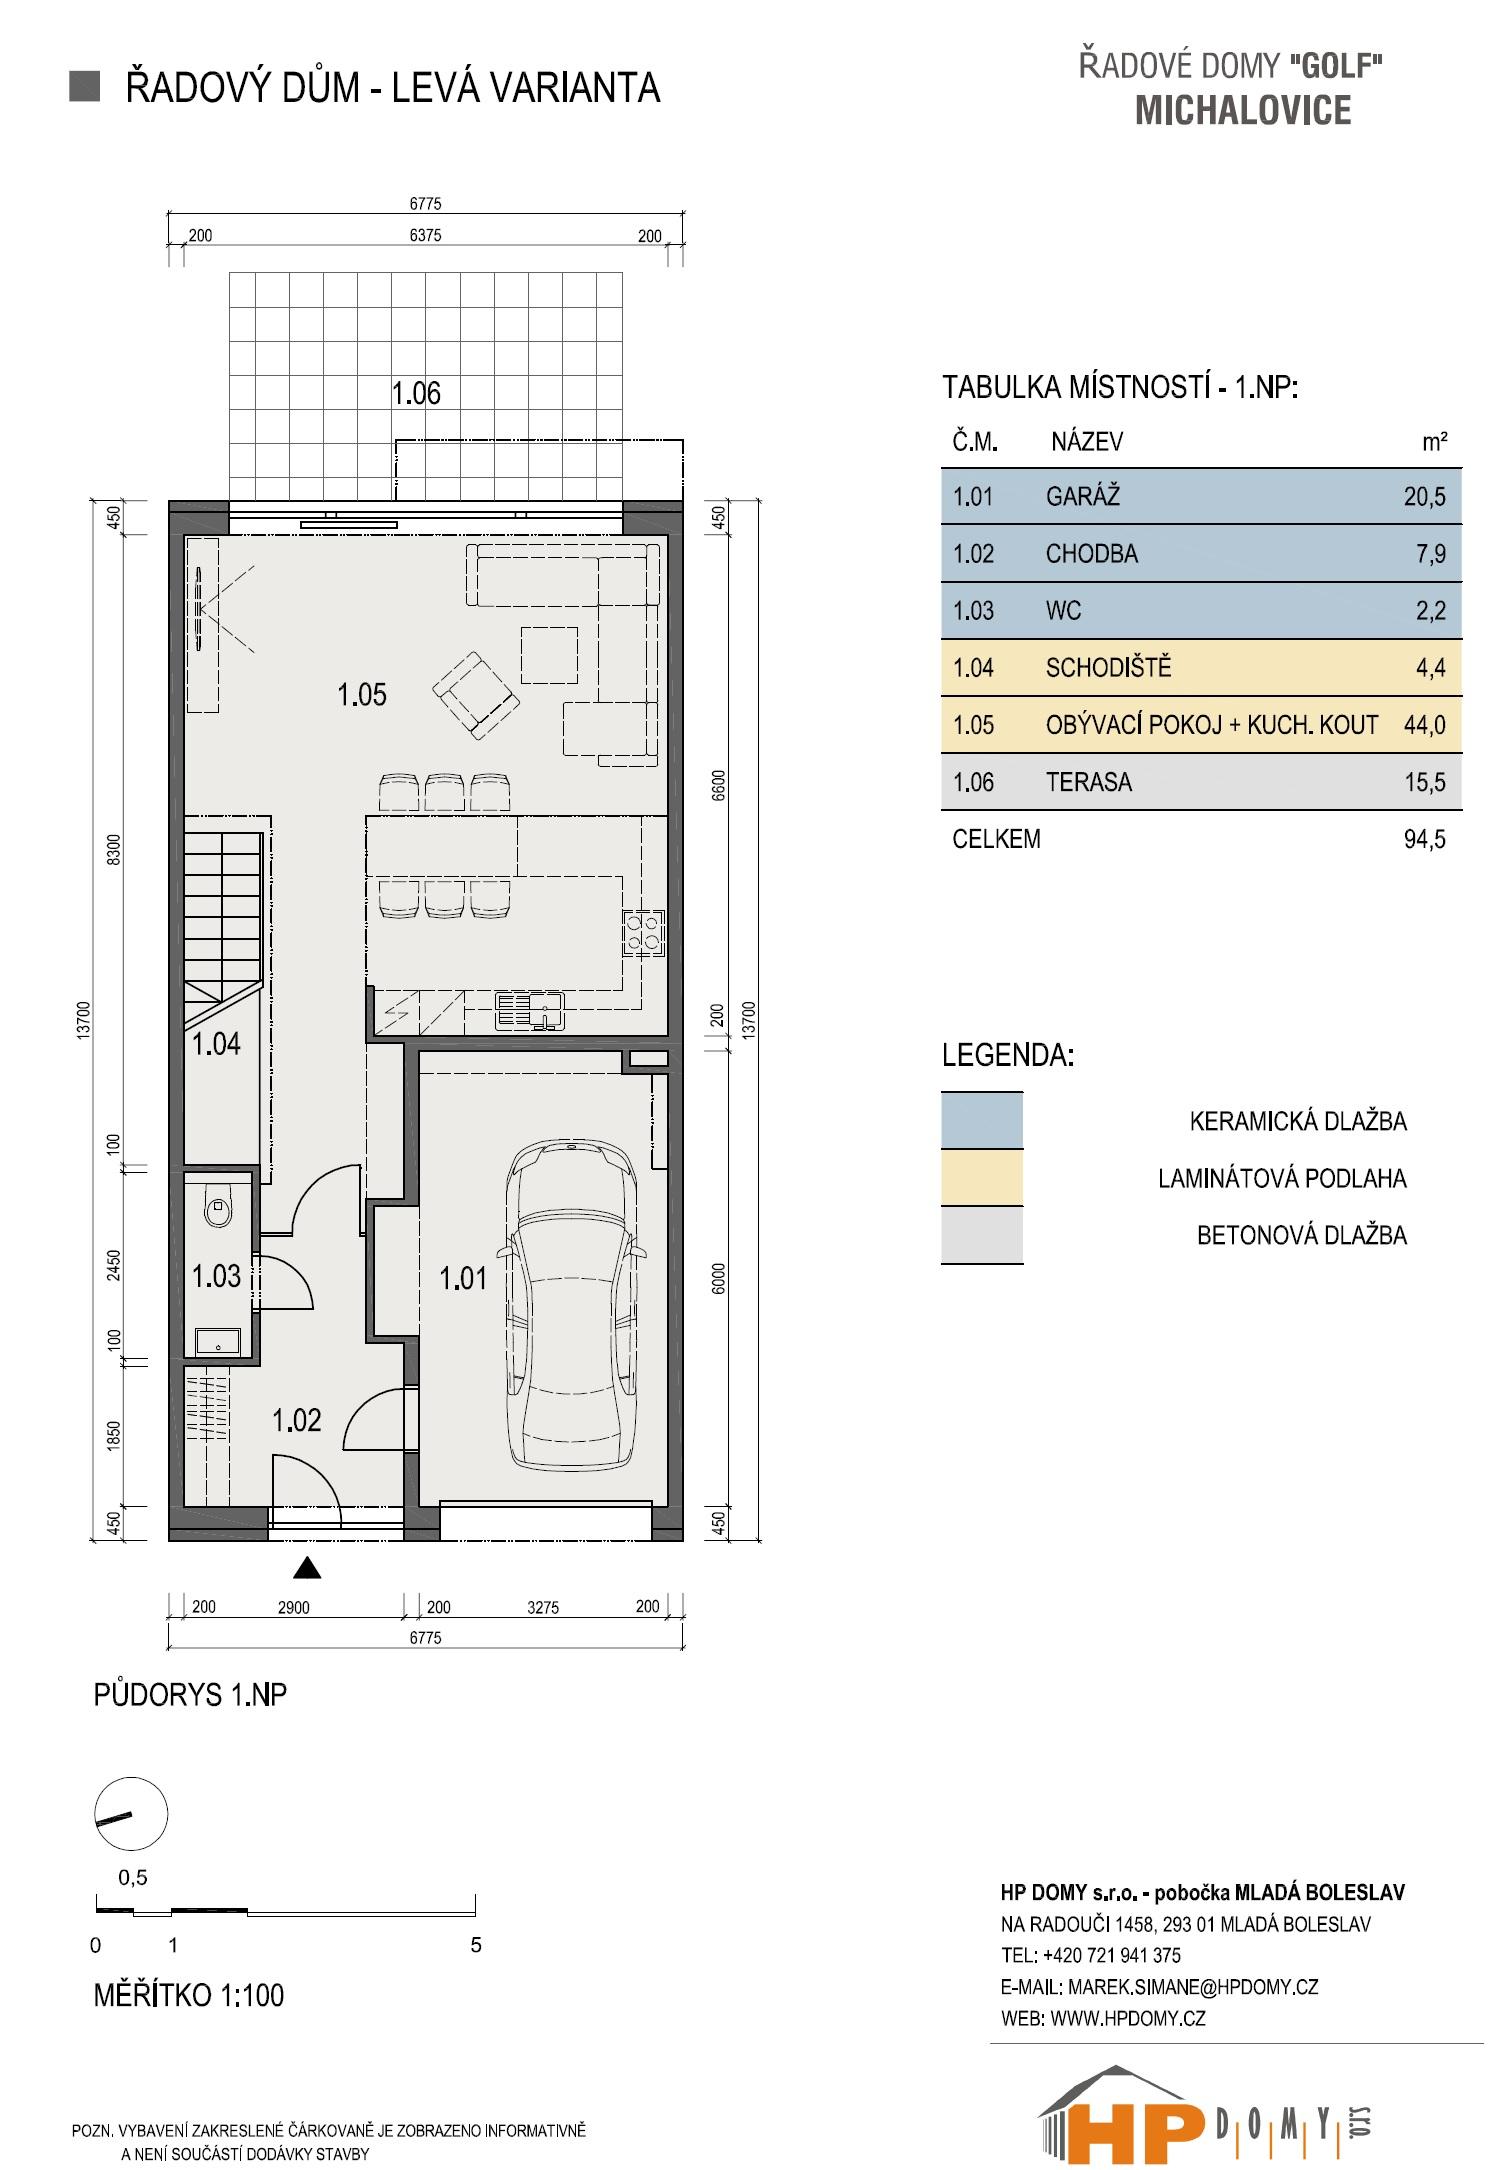 Michalovice - řadové domy od HP Domy: Půdorys